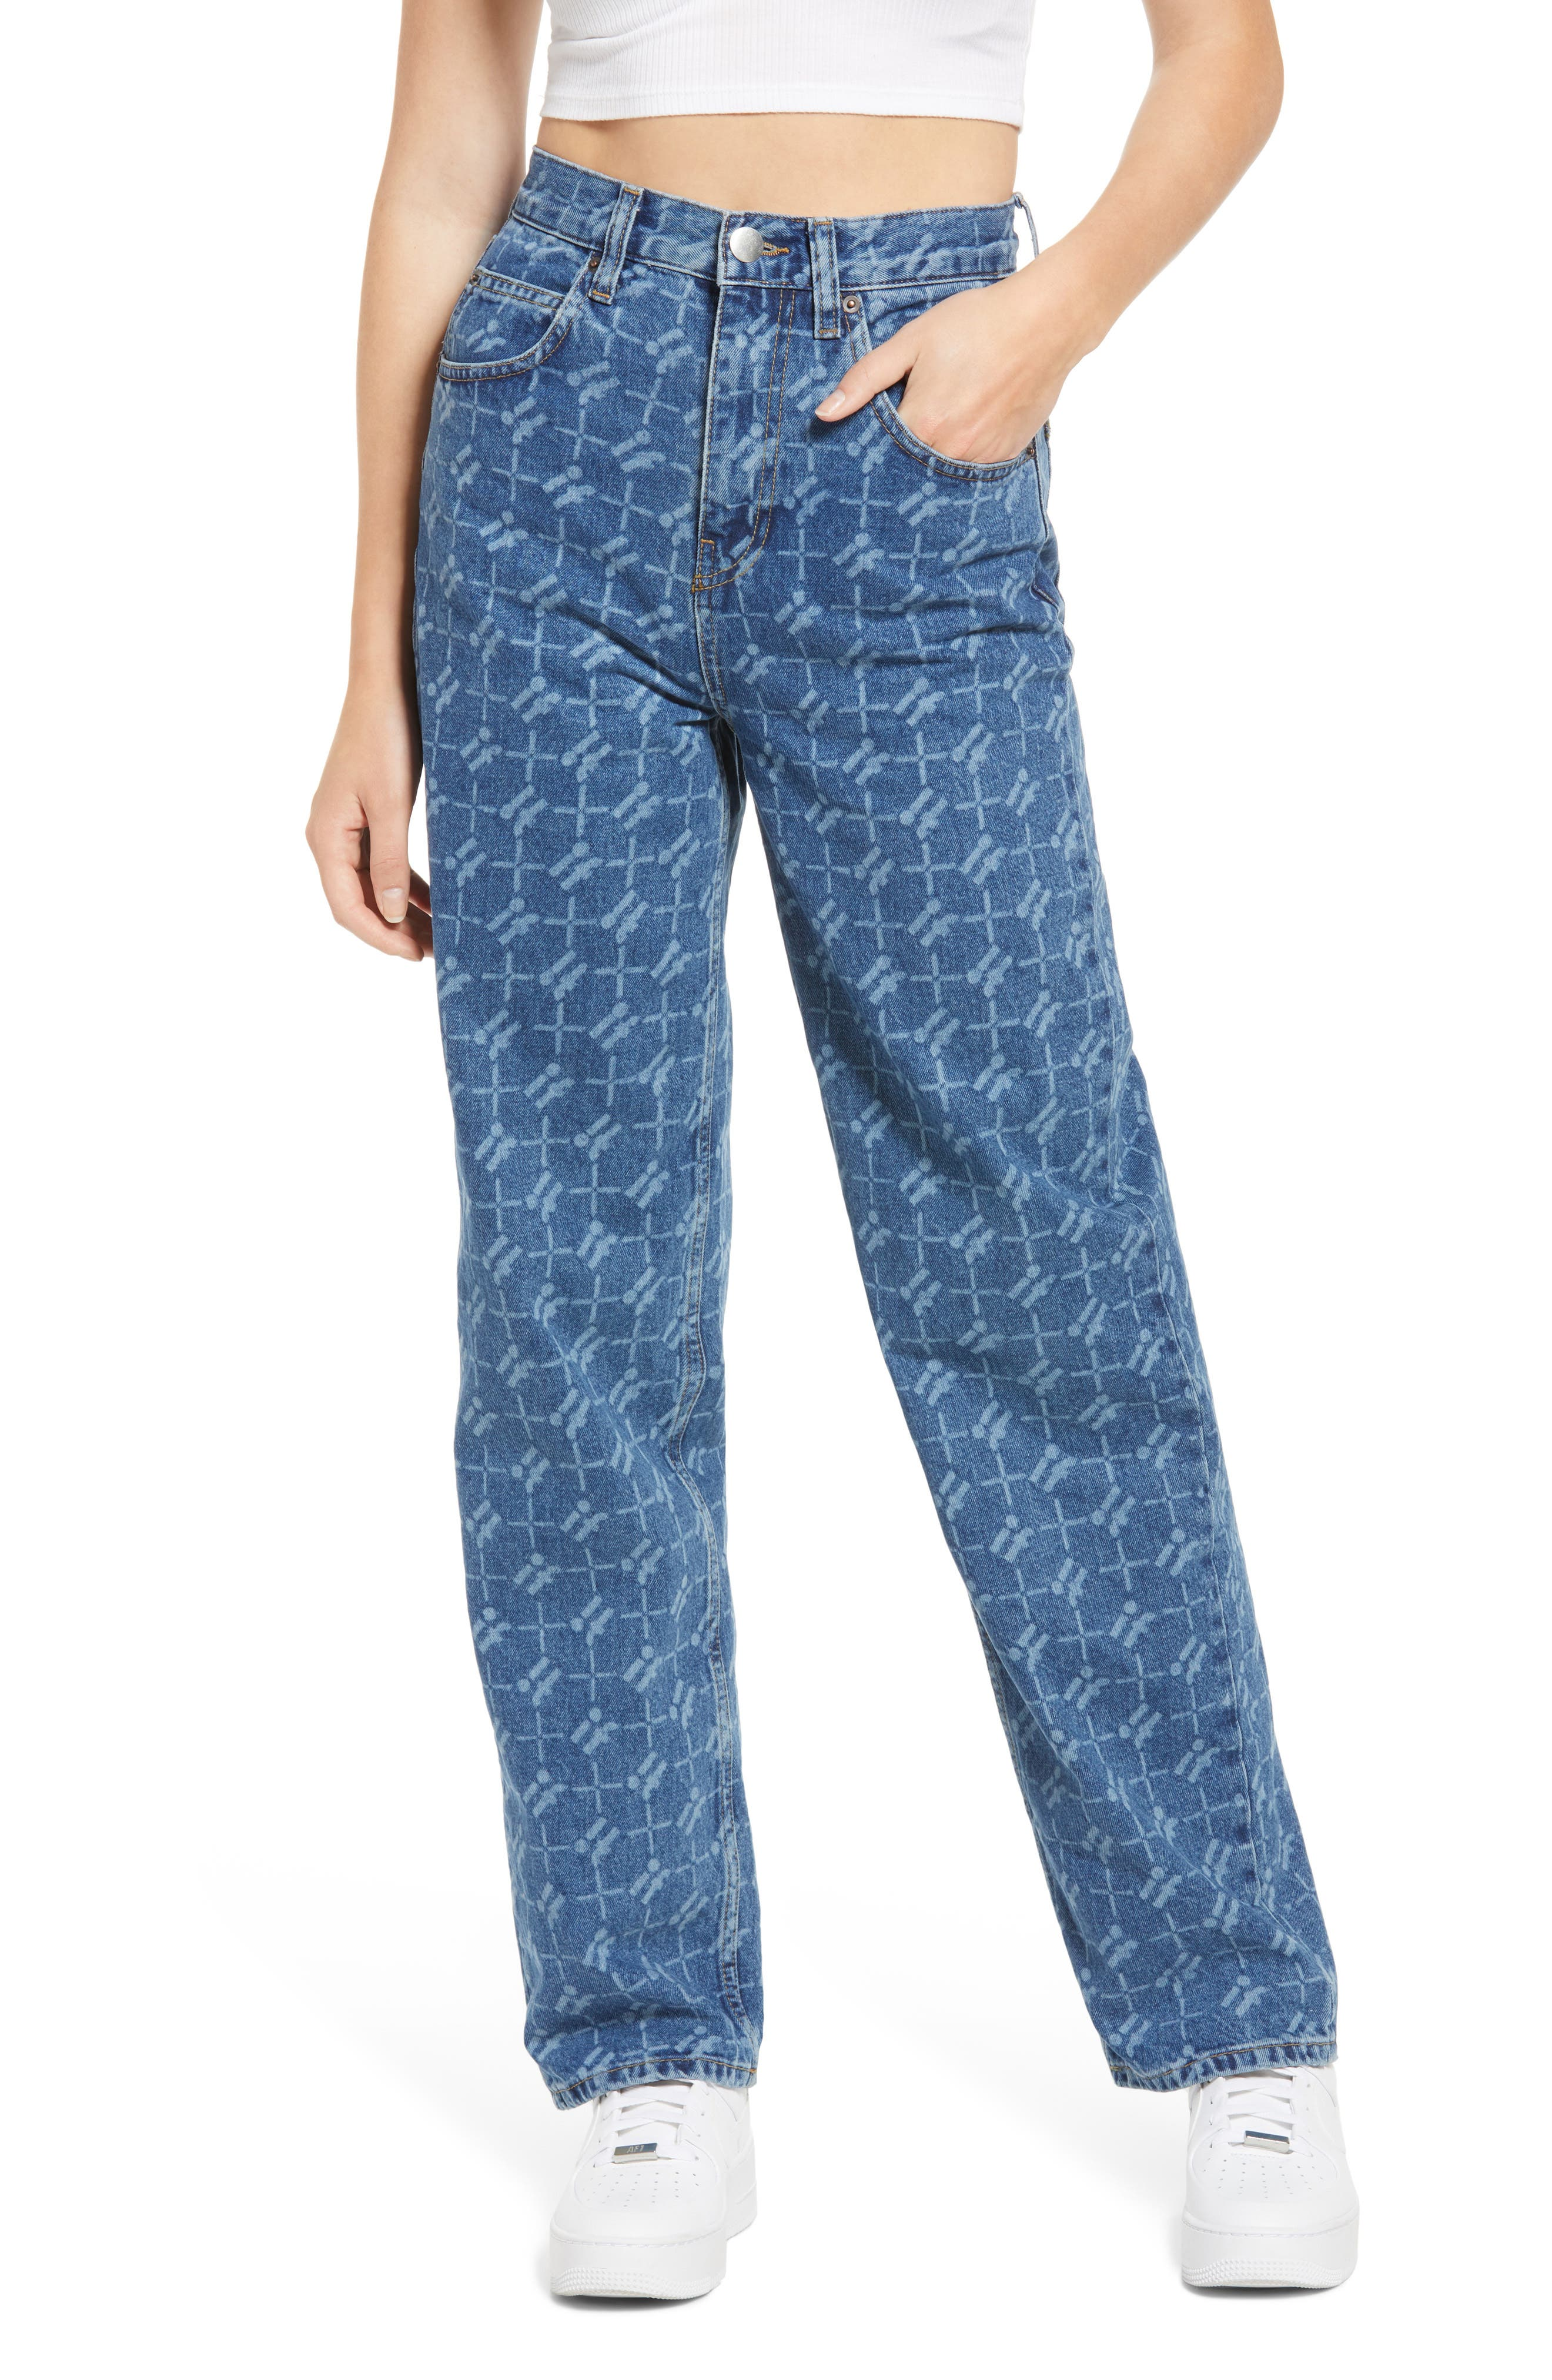 Monogram High Waist Jeans